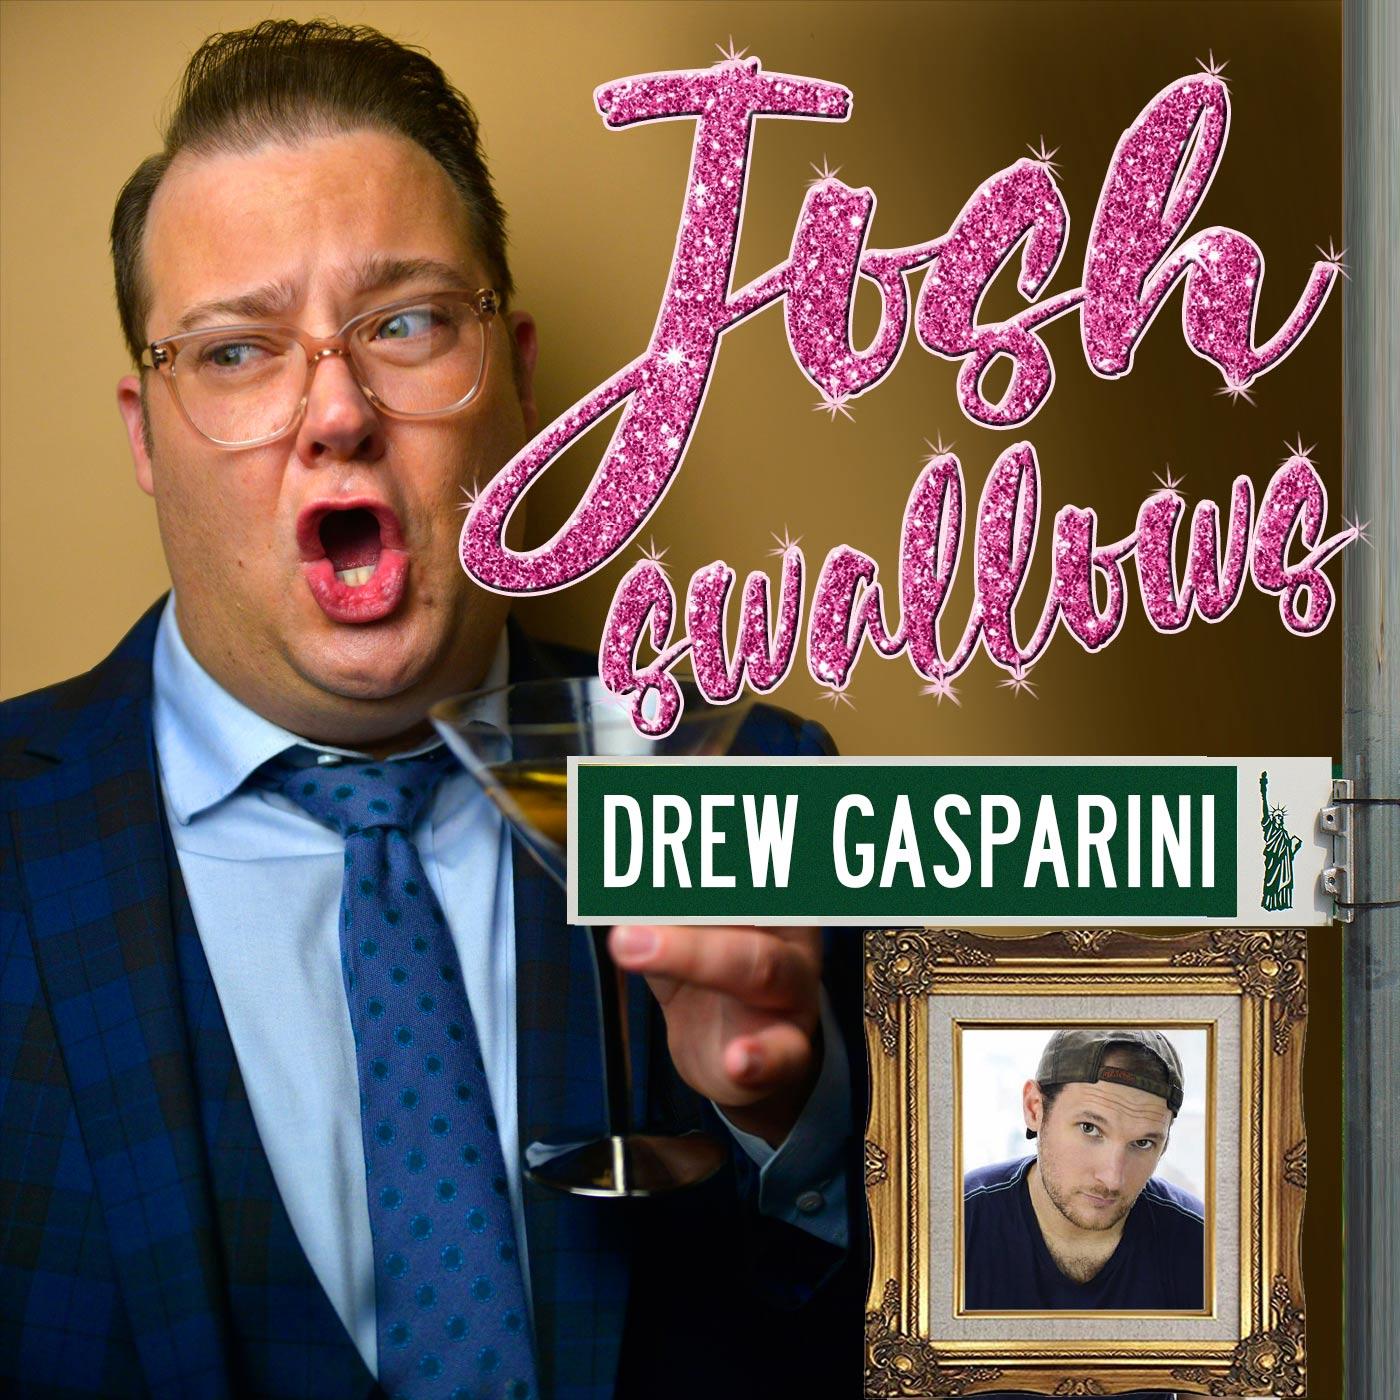 Ep40 - Drew Gasparini: The Husky Kid